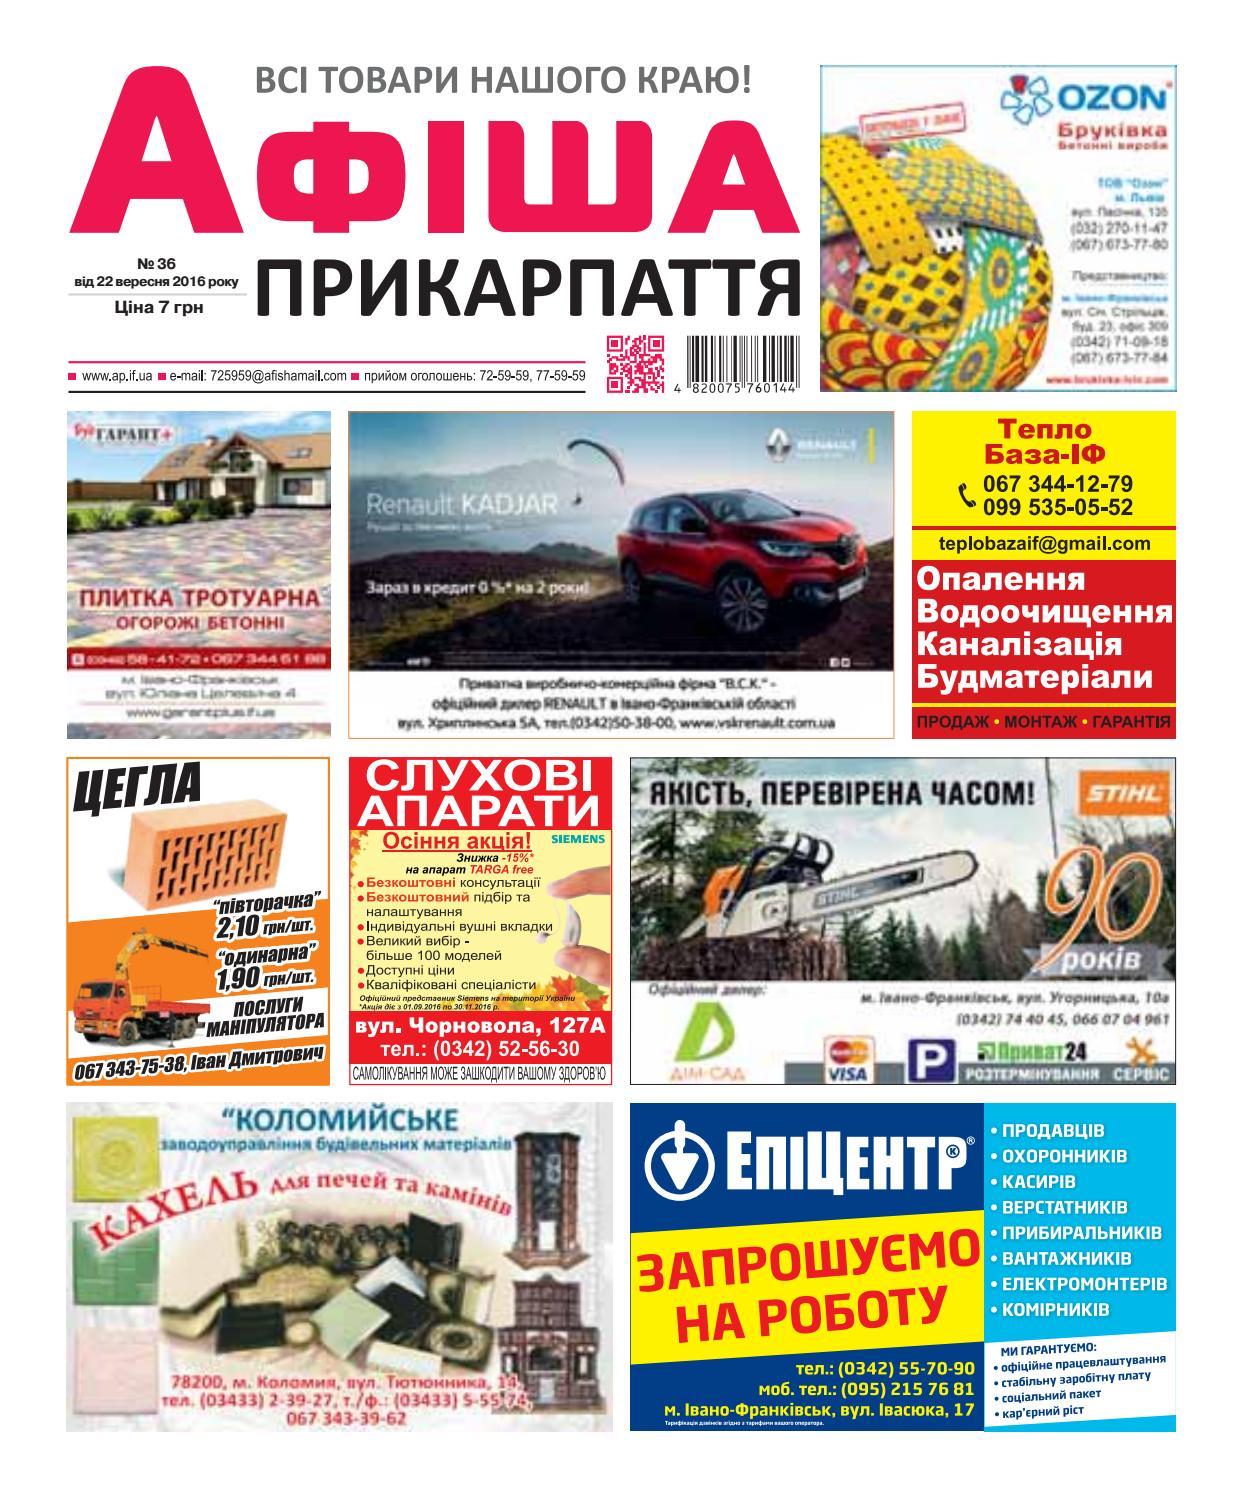 Афіша ПРИКАРПАТТЯ №36 by Olya Olya - issuu 7953f4df32d0c